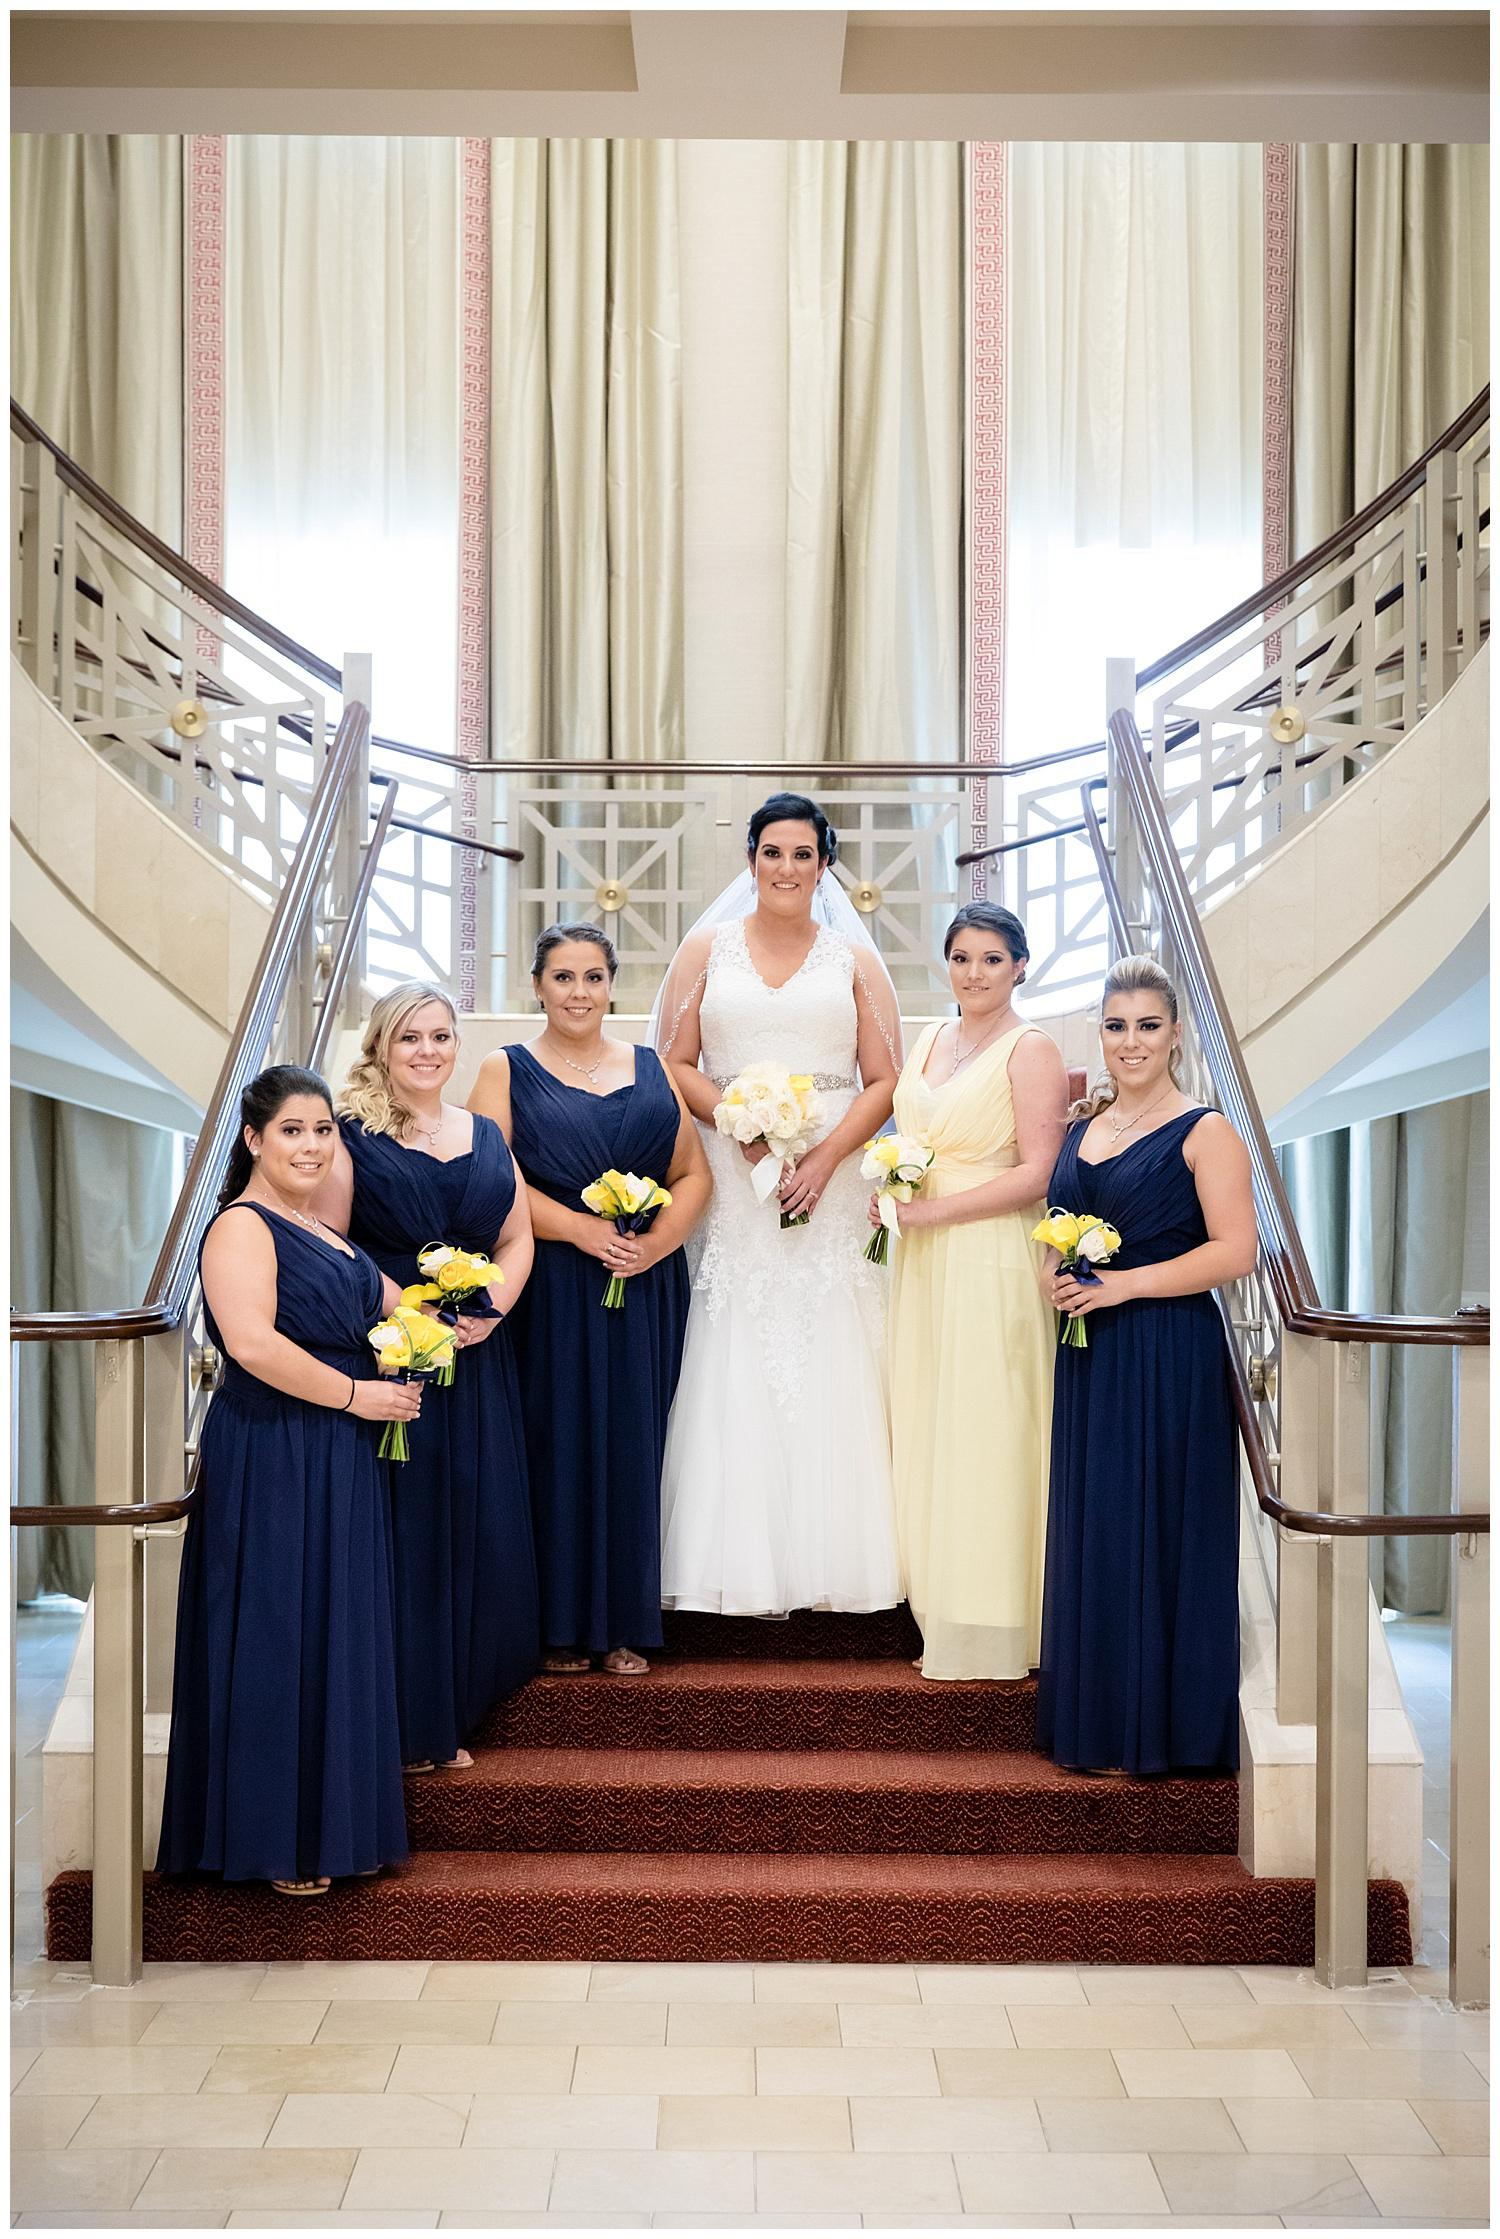 Hillside-Country-Club-Wedding-Photography-26-North-Studios-009.j